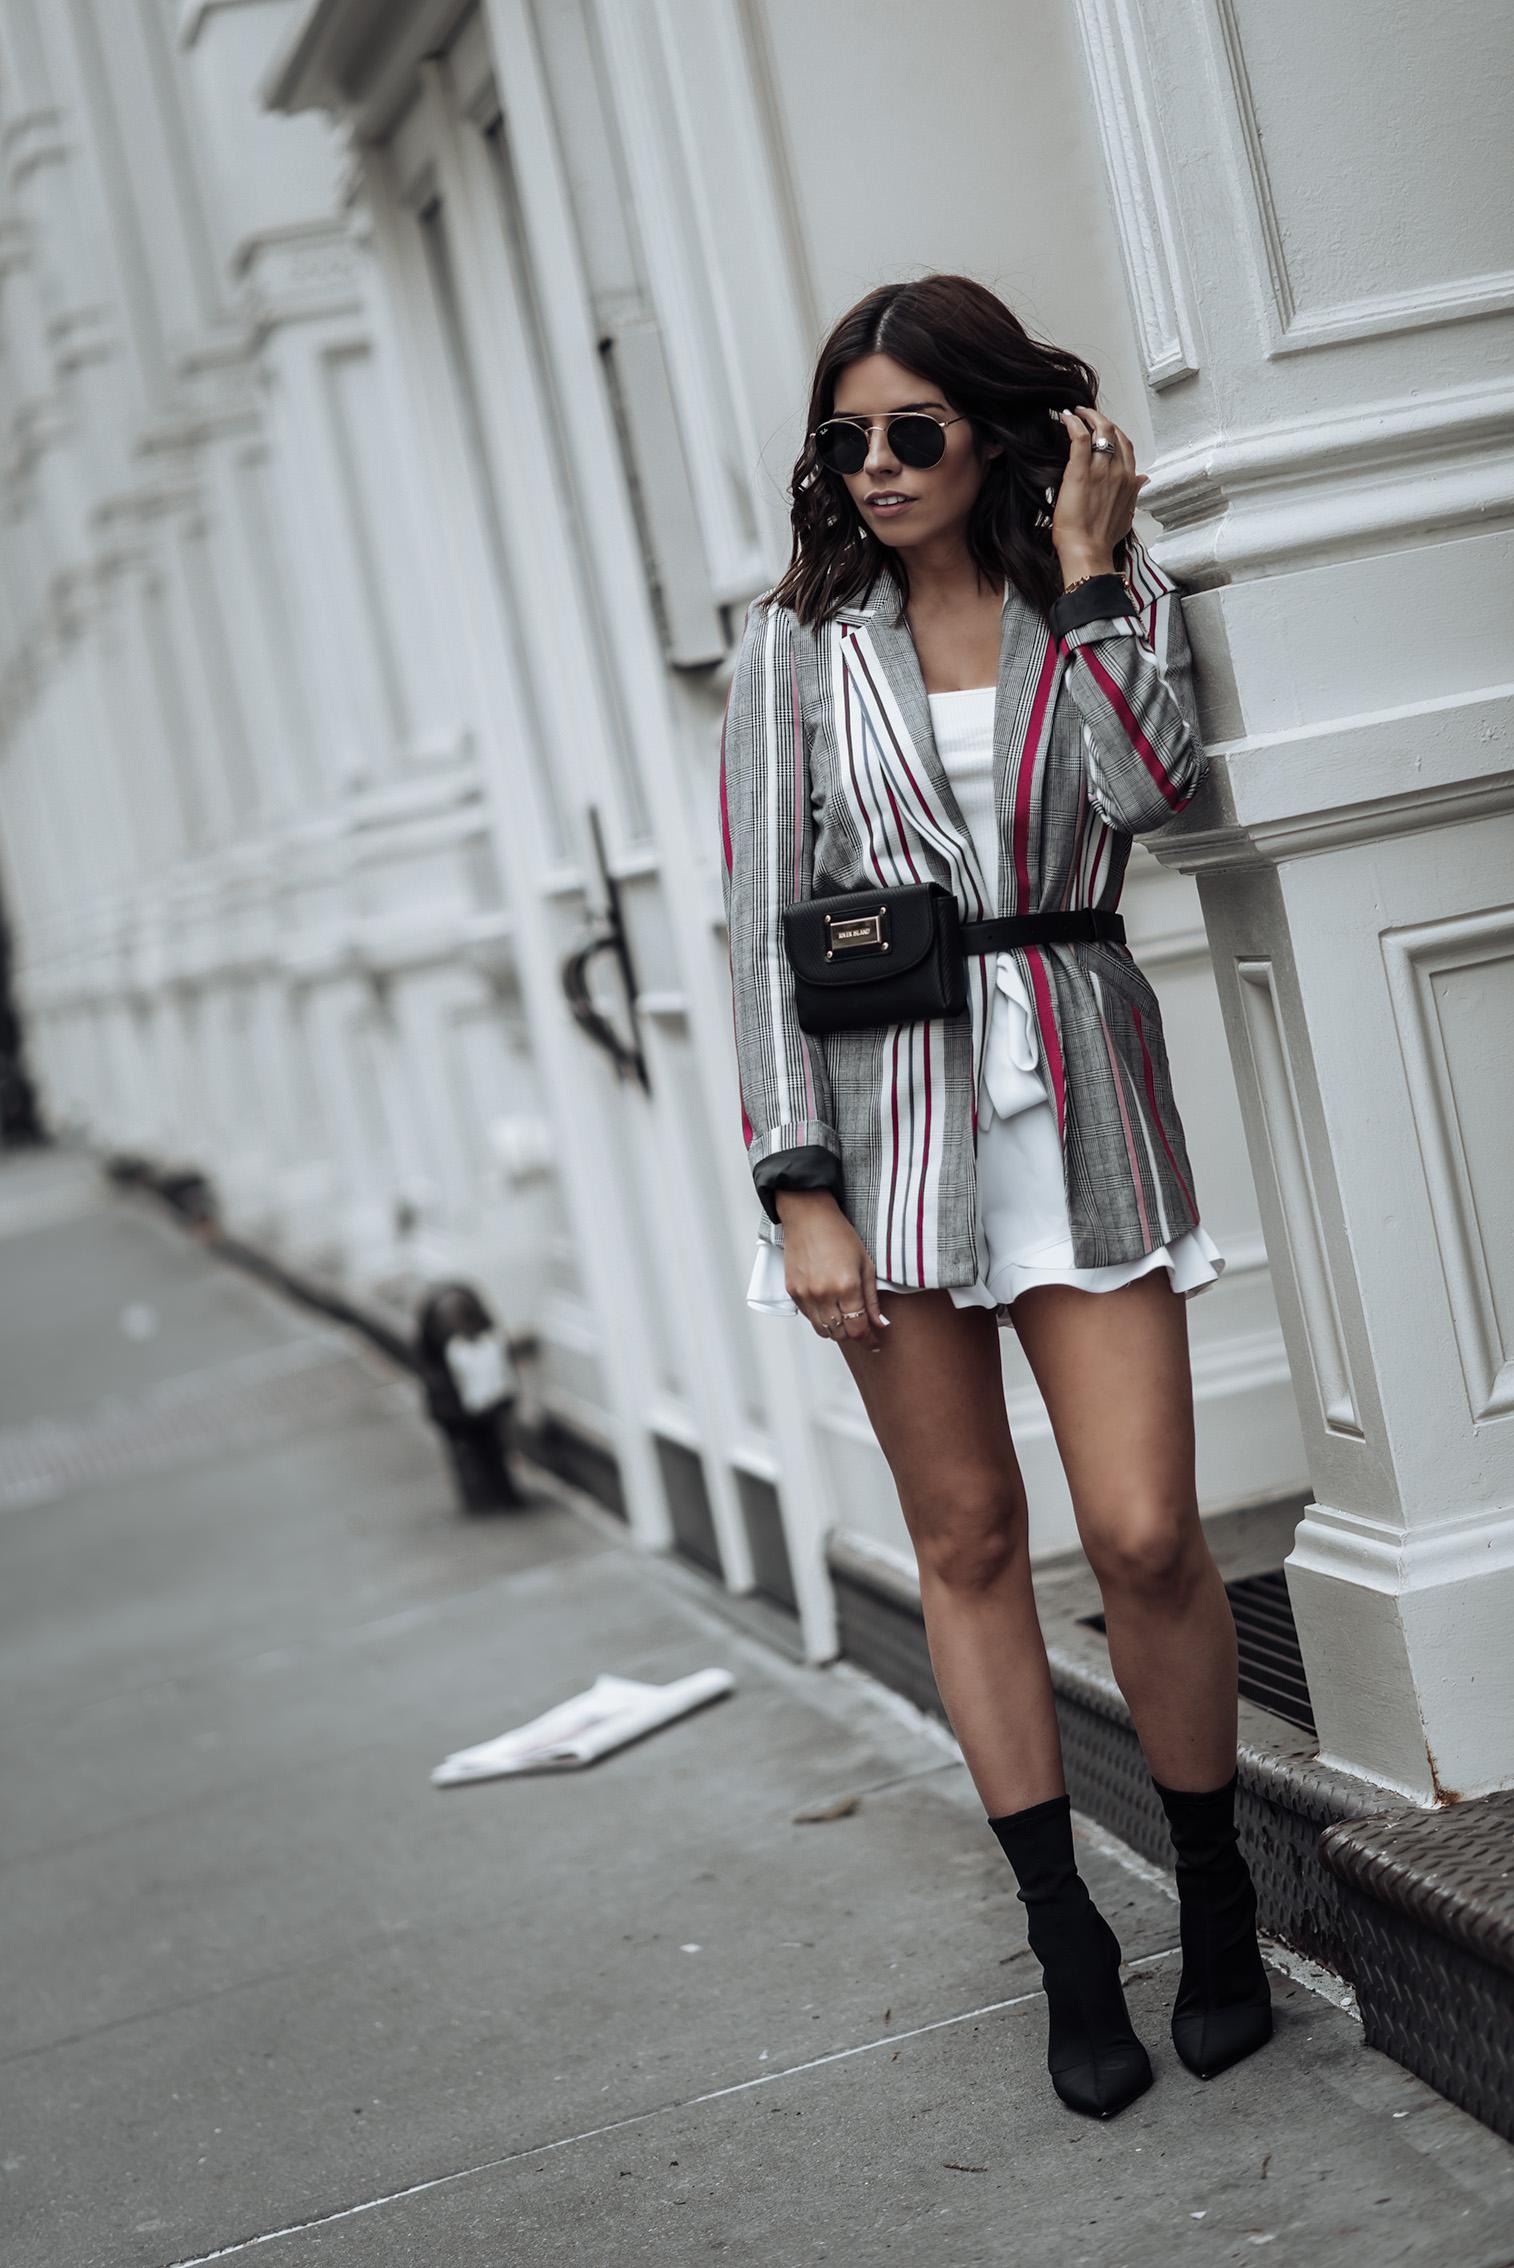 River Island Chic  Striped Blazer   White Frill Shorts   #liketkit #riverisland #anklesockboots #bumbag